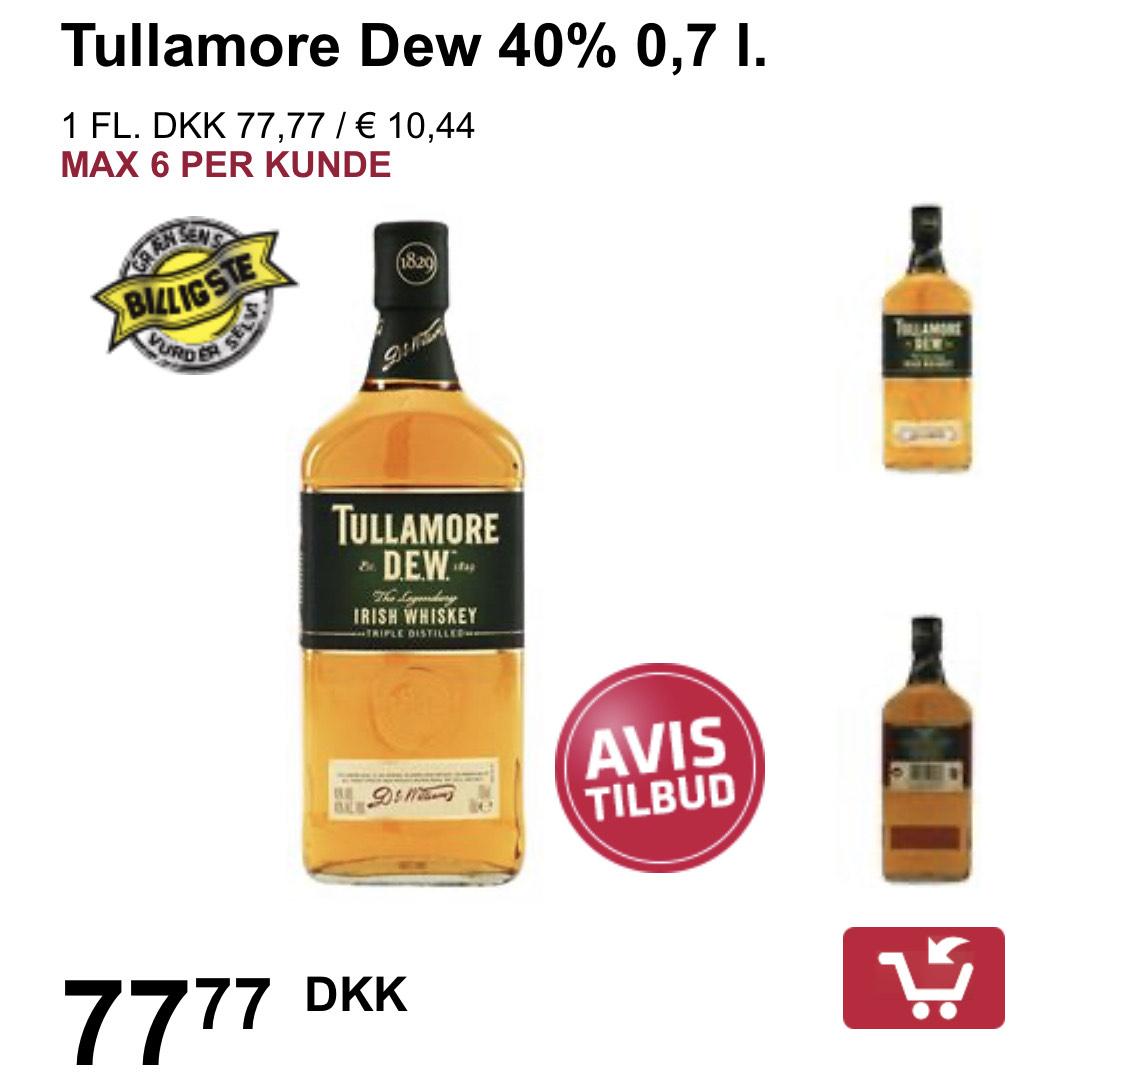 Tullamore Dew Whisky bei allen Fleggaard Märkten